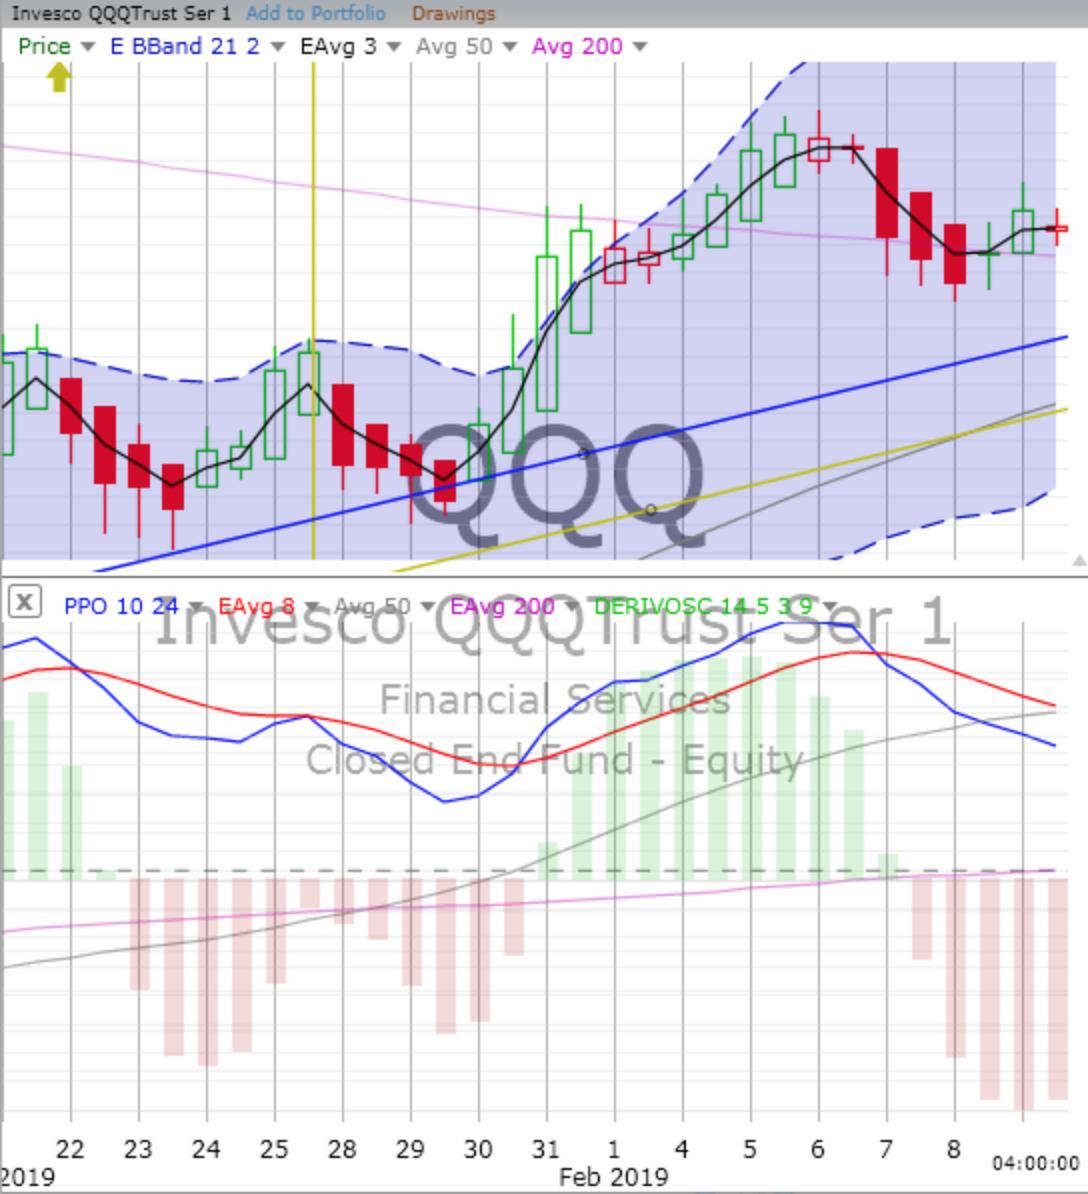 Tuesday, February 12, 2019, Stock Trading: Chart Training